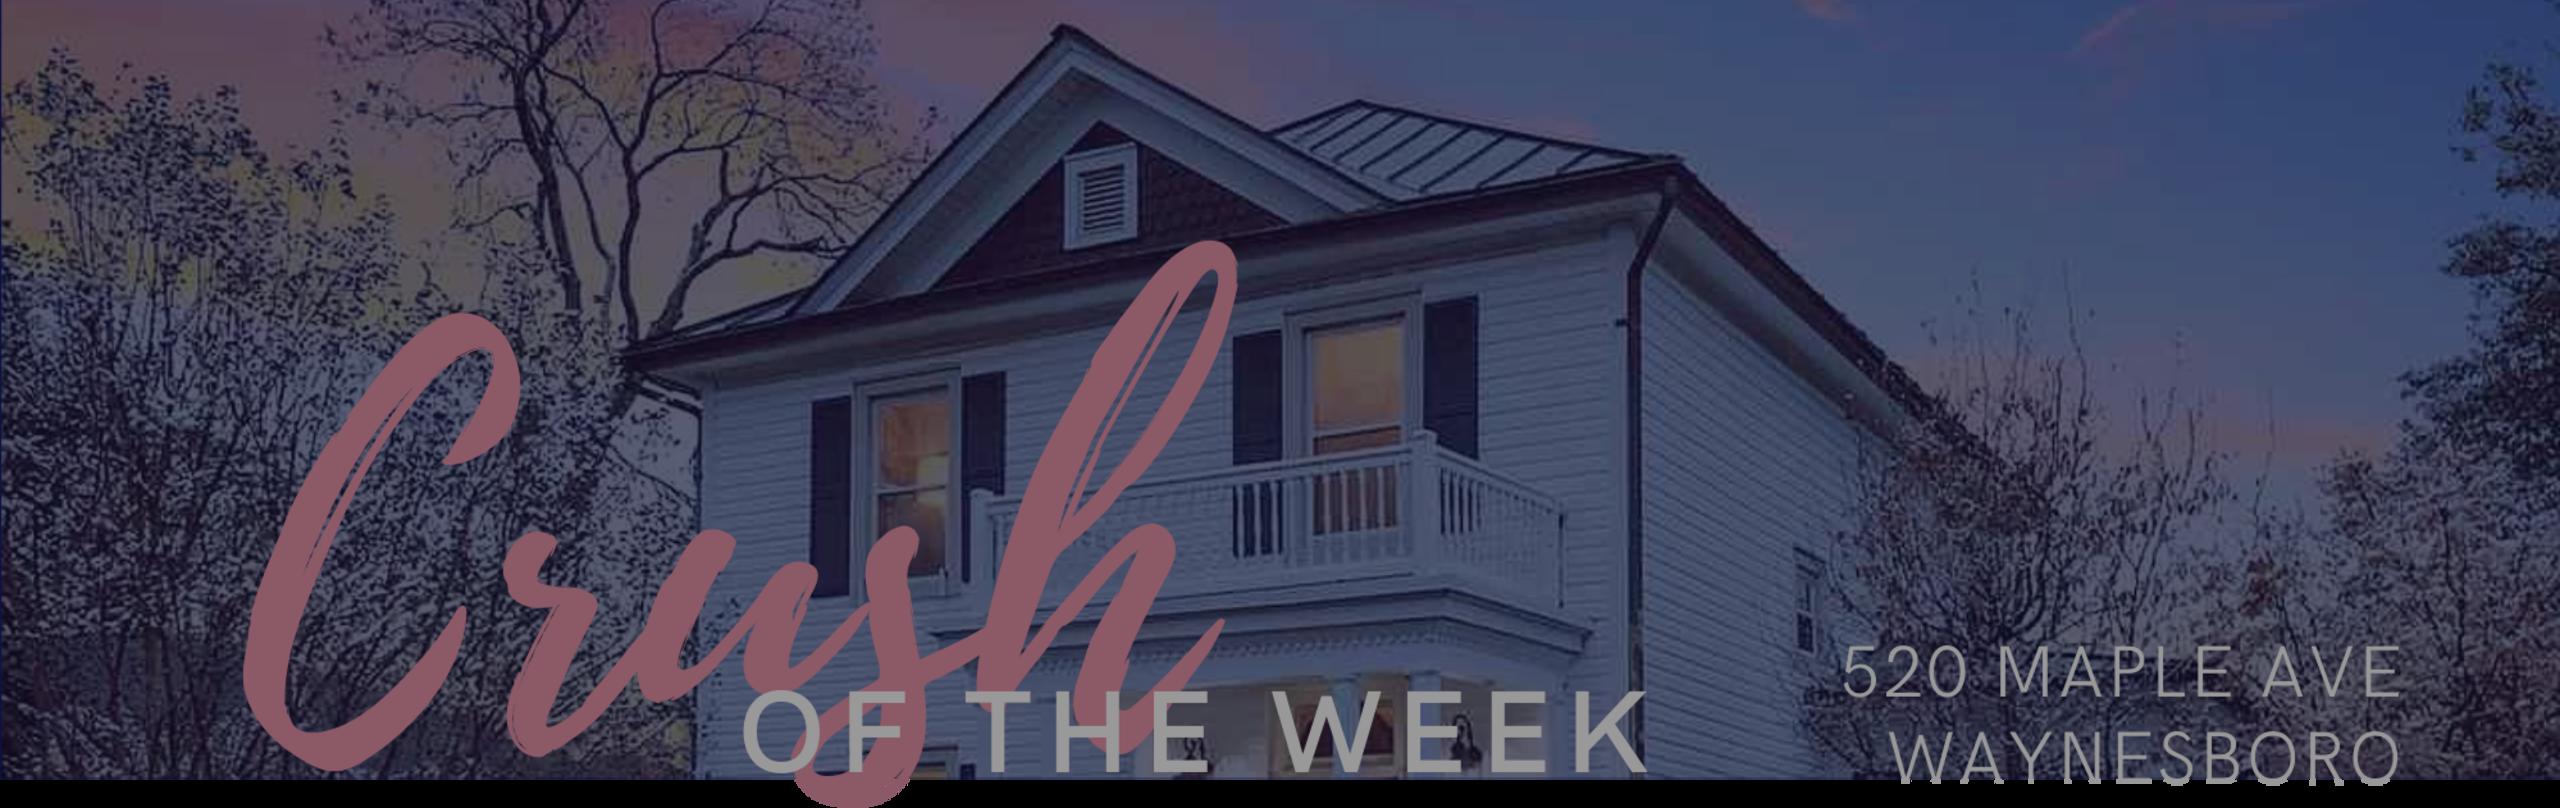 Crush of the Week – TREE STREET Beauty